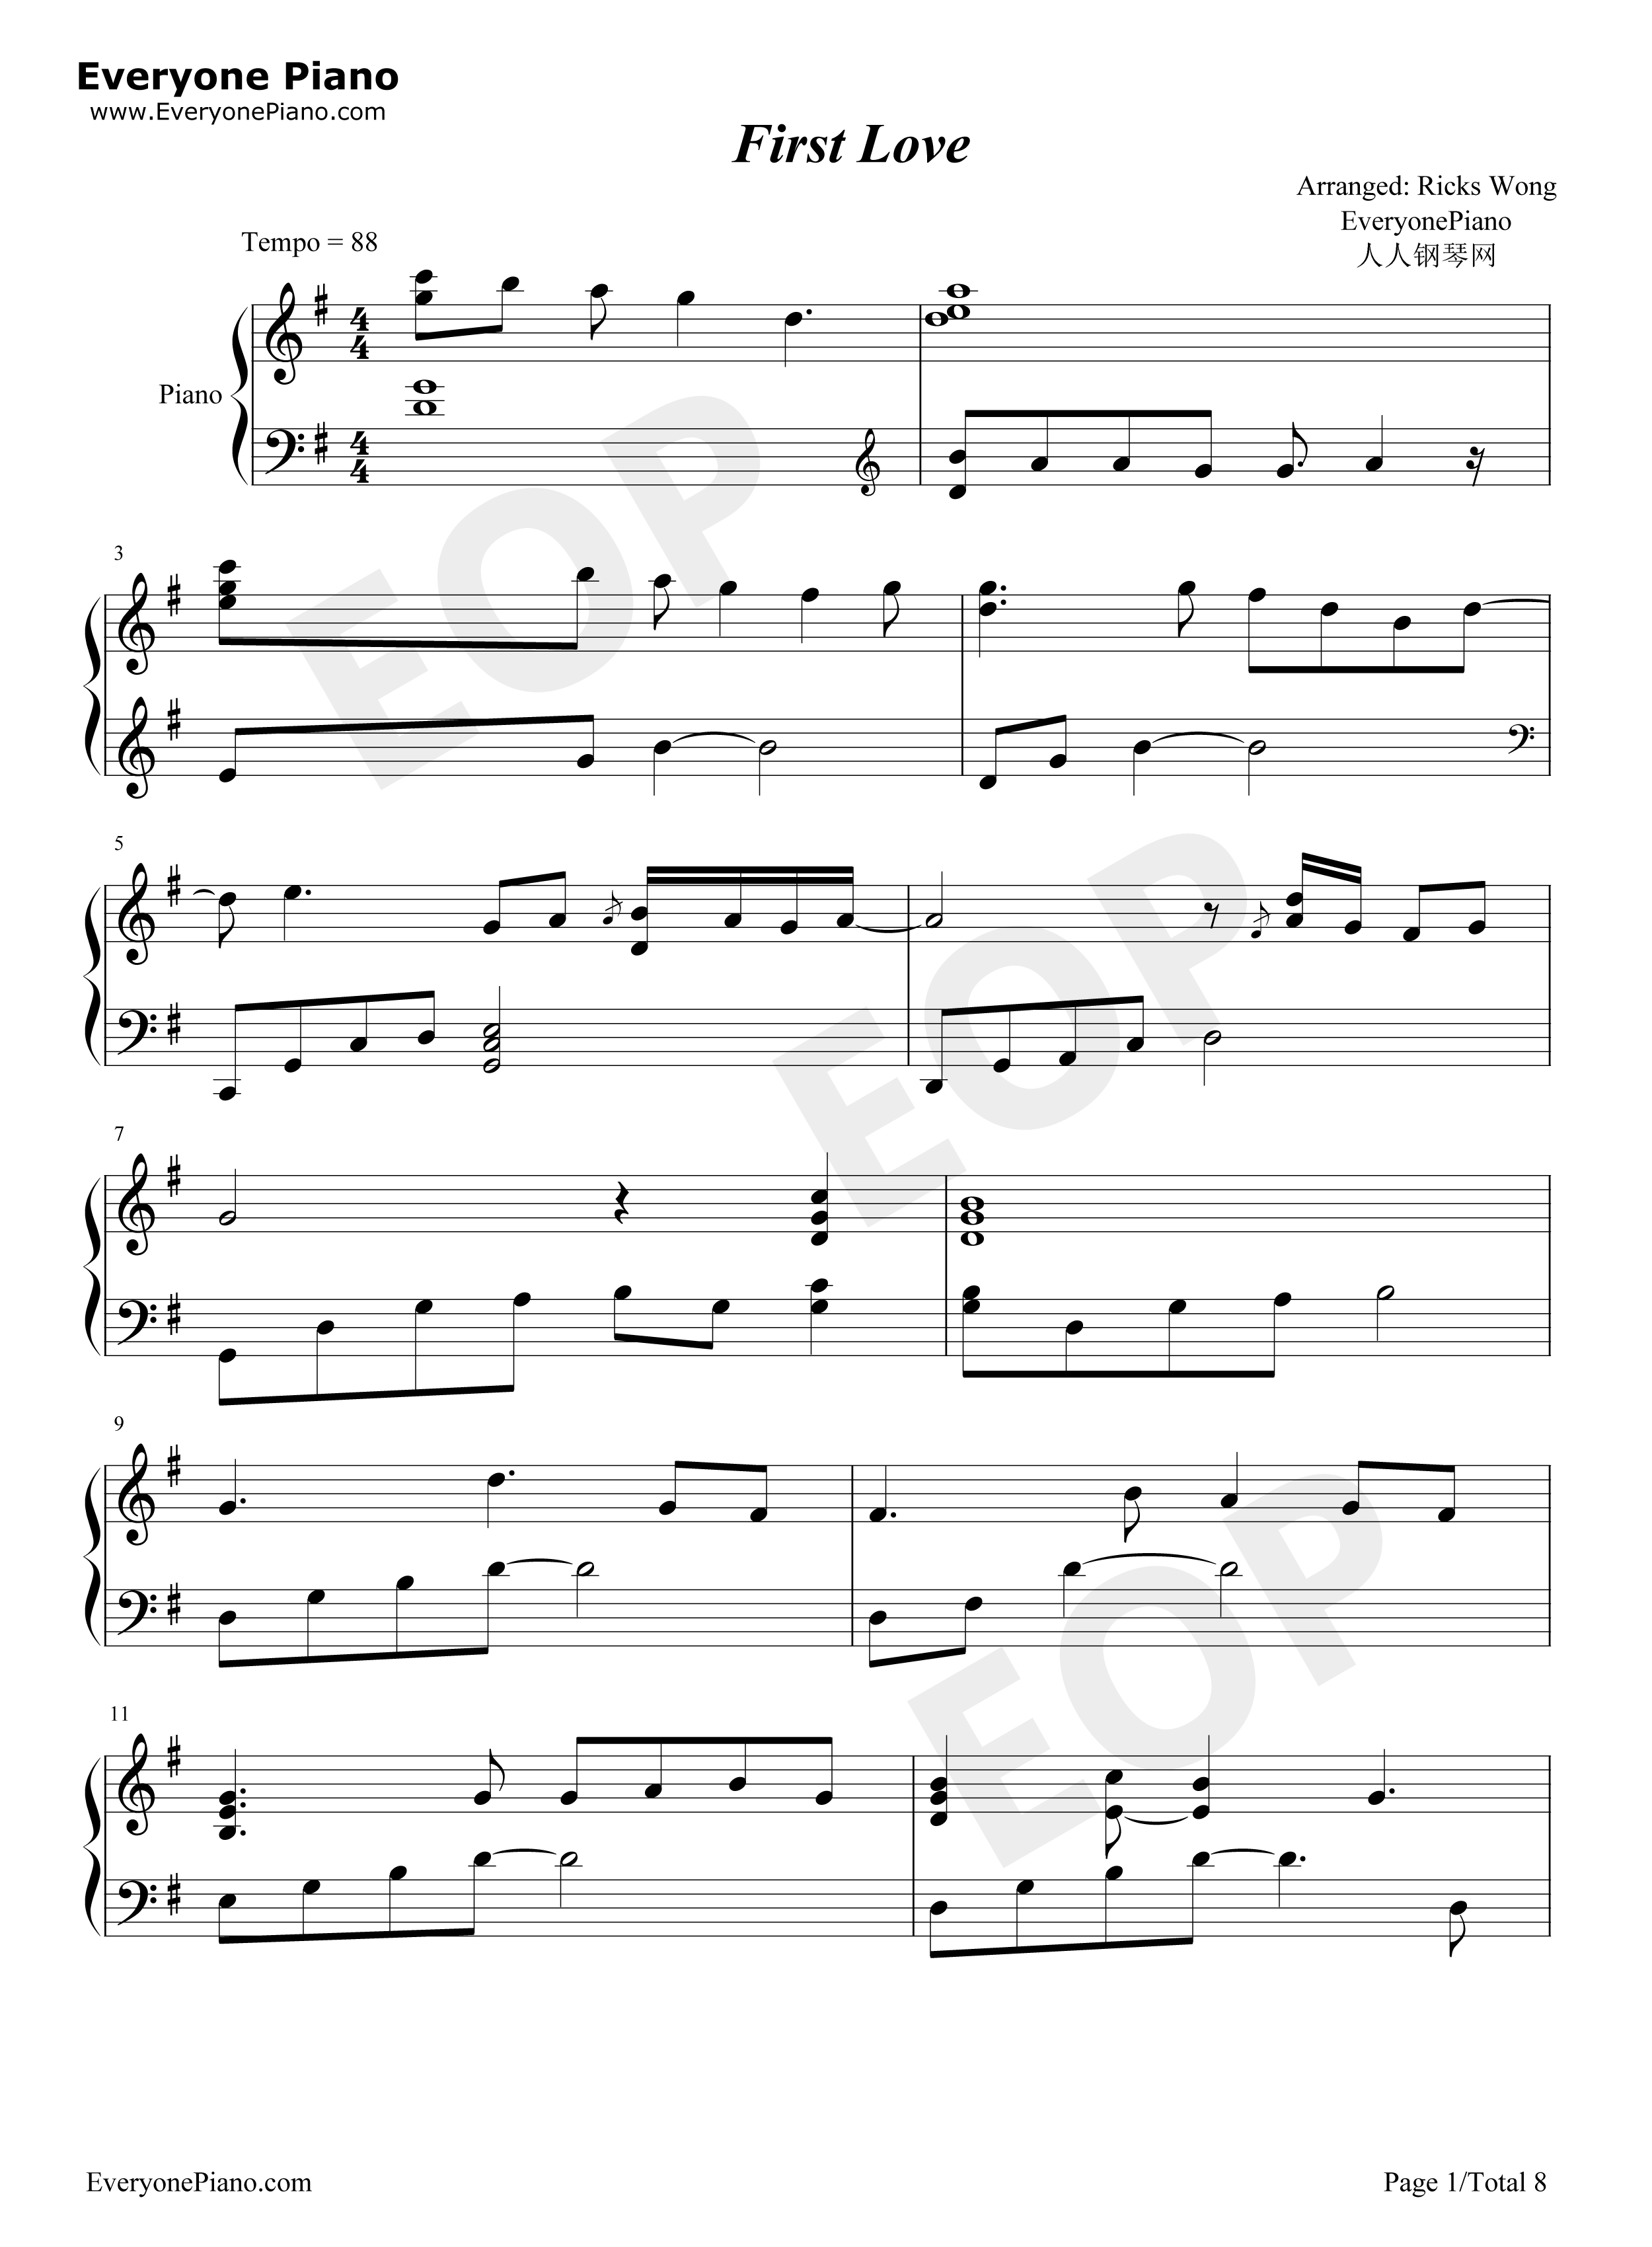 First love utada hikaru partitura piano pdf